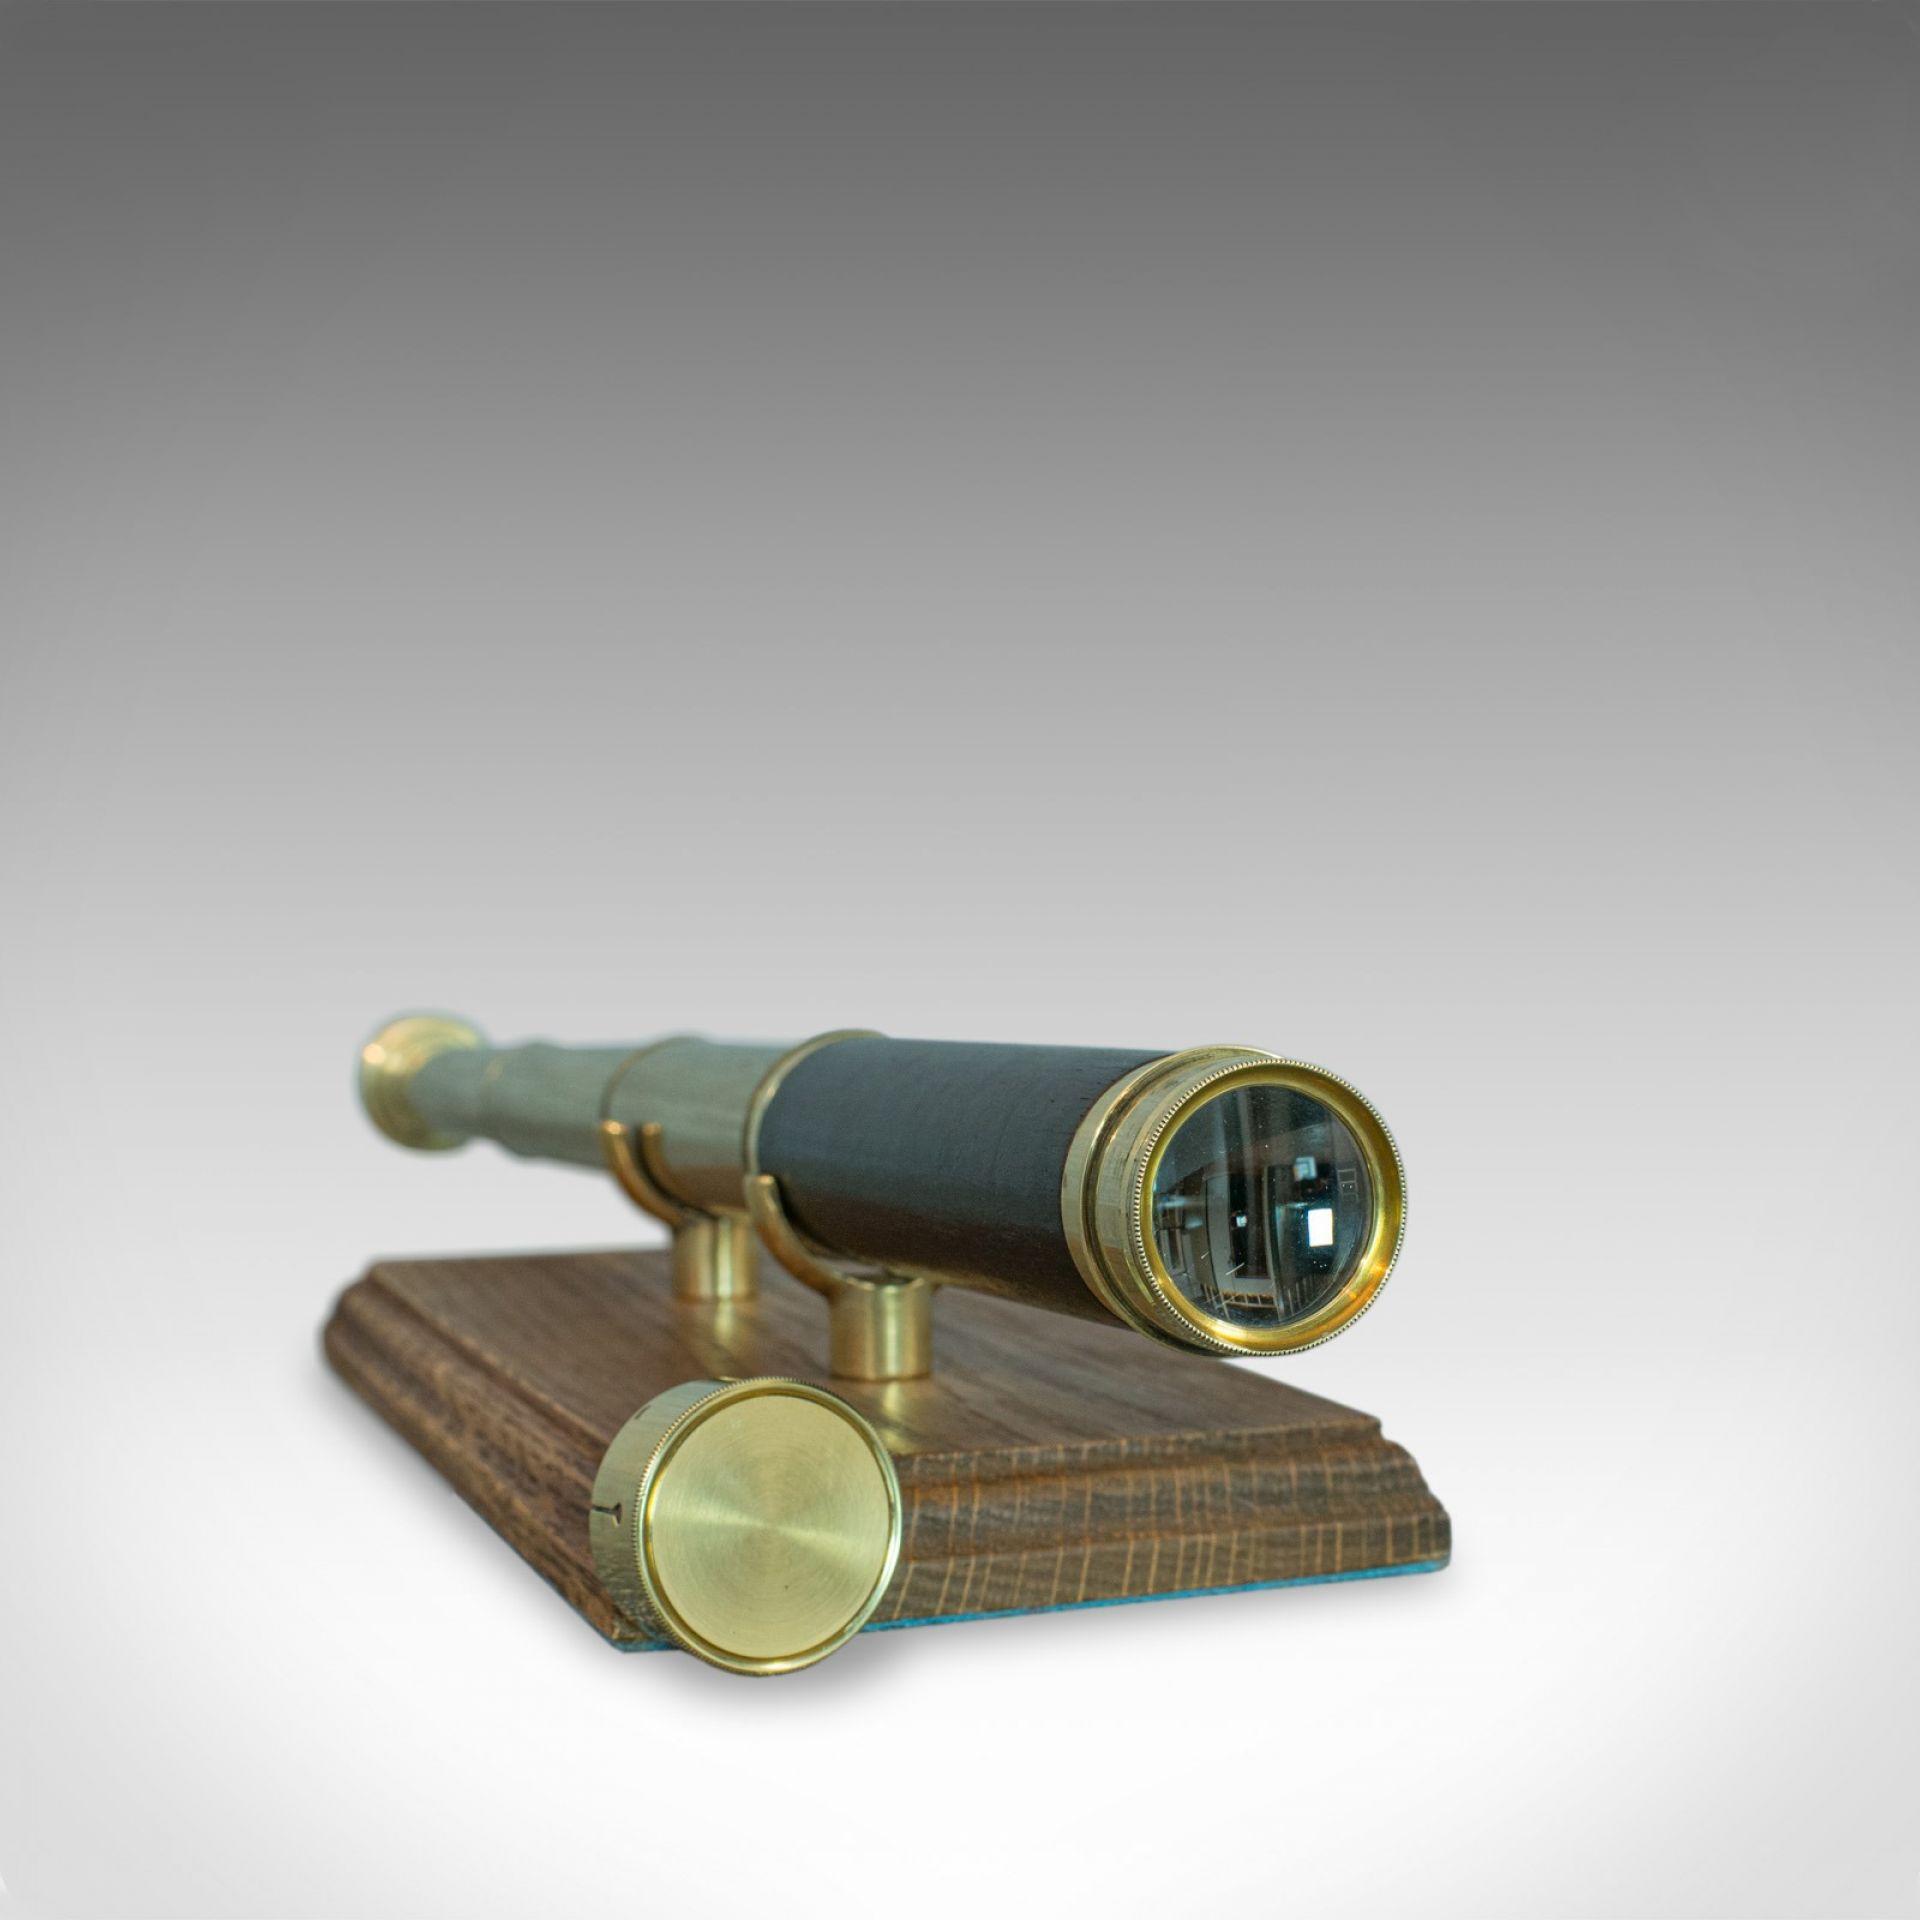 Antique Pocket Telescope, Three Draw, Refractor, English, Victorian, Circa 1870